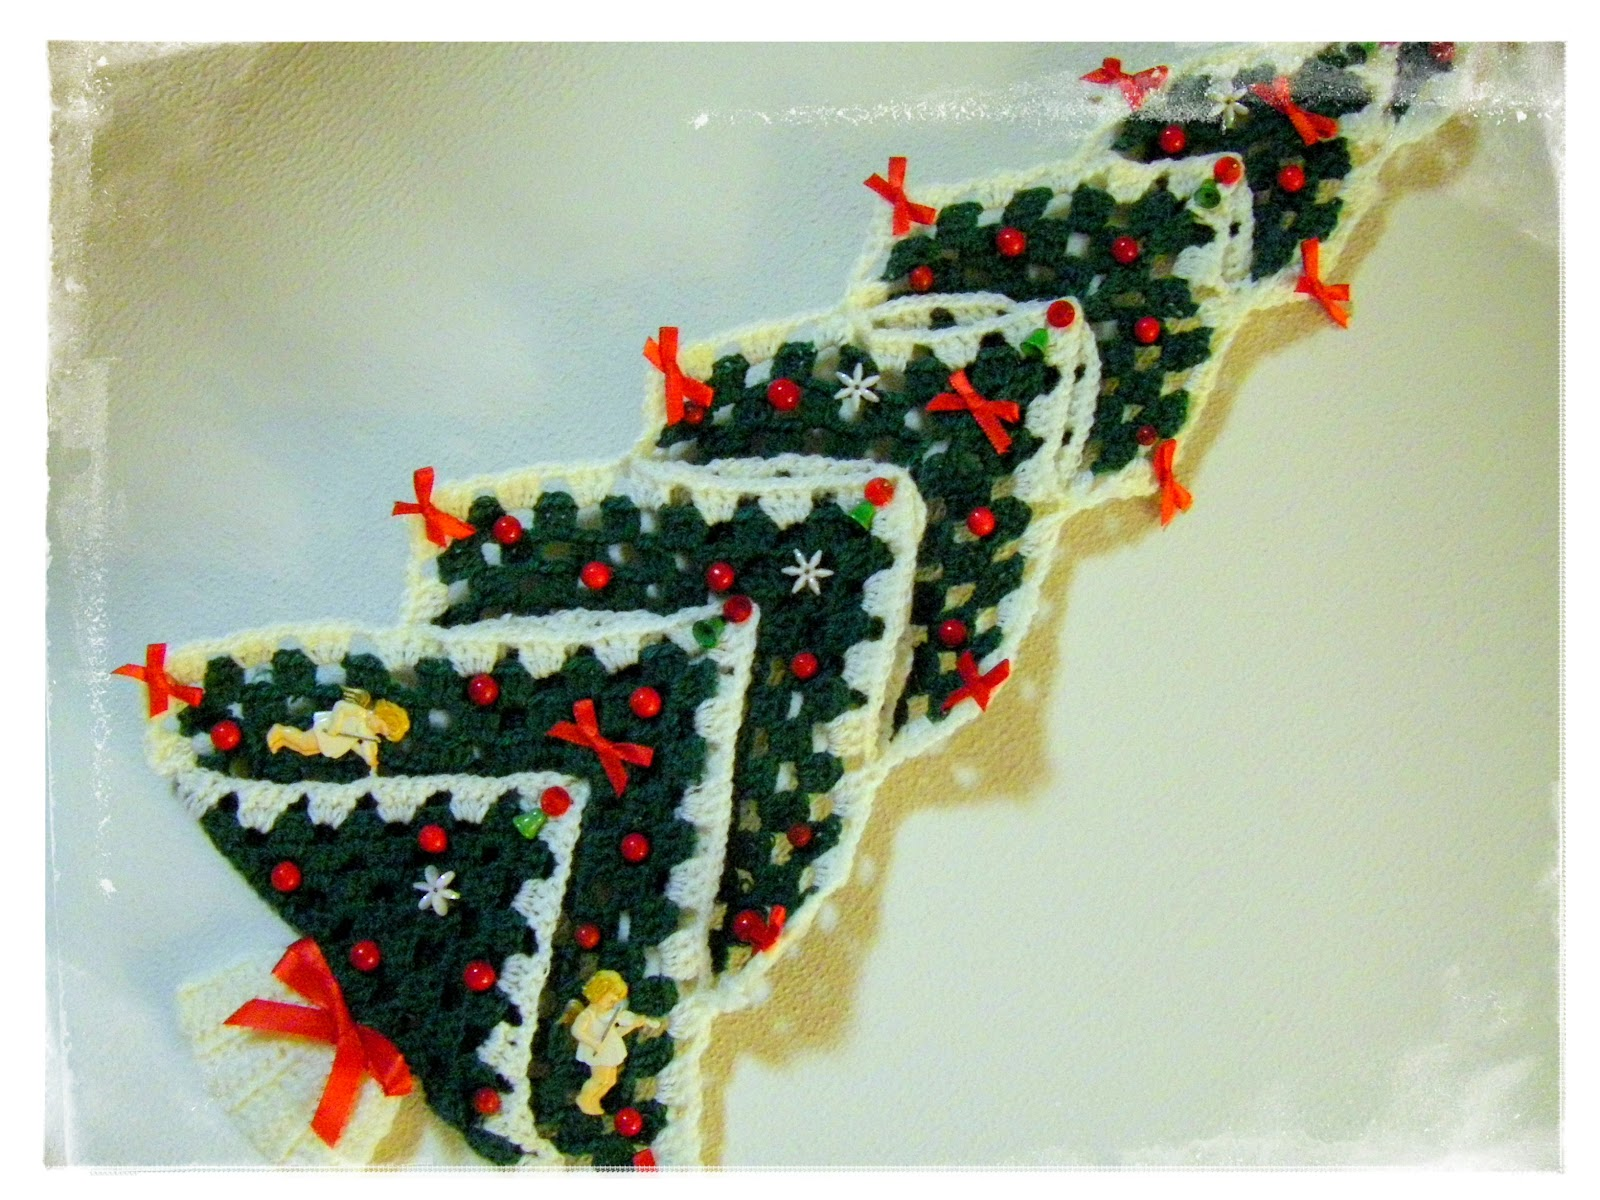 sew ritzy~titzy: I SPY: vintage granny square christmas tree